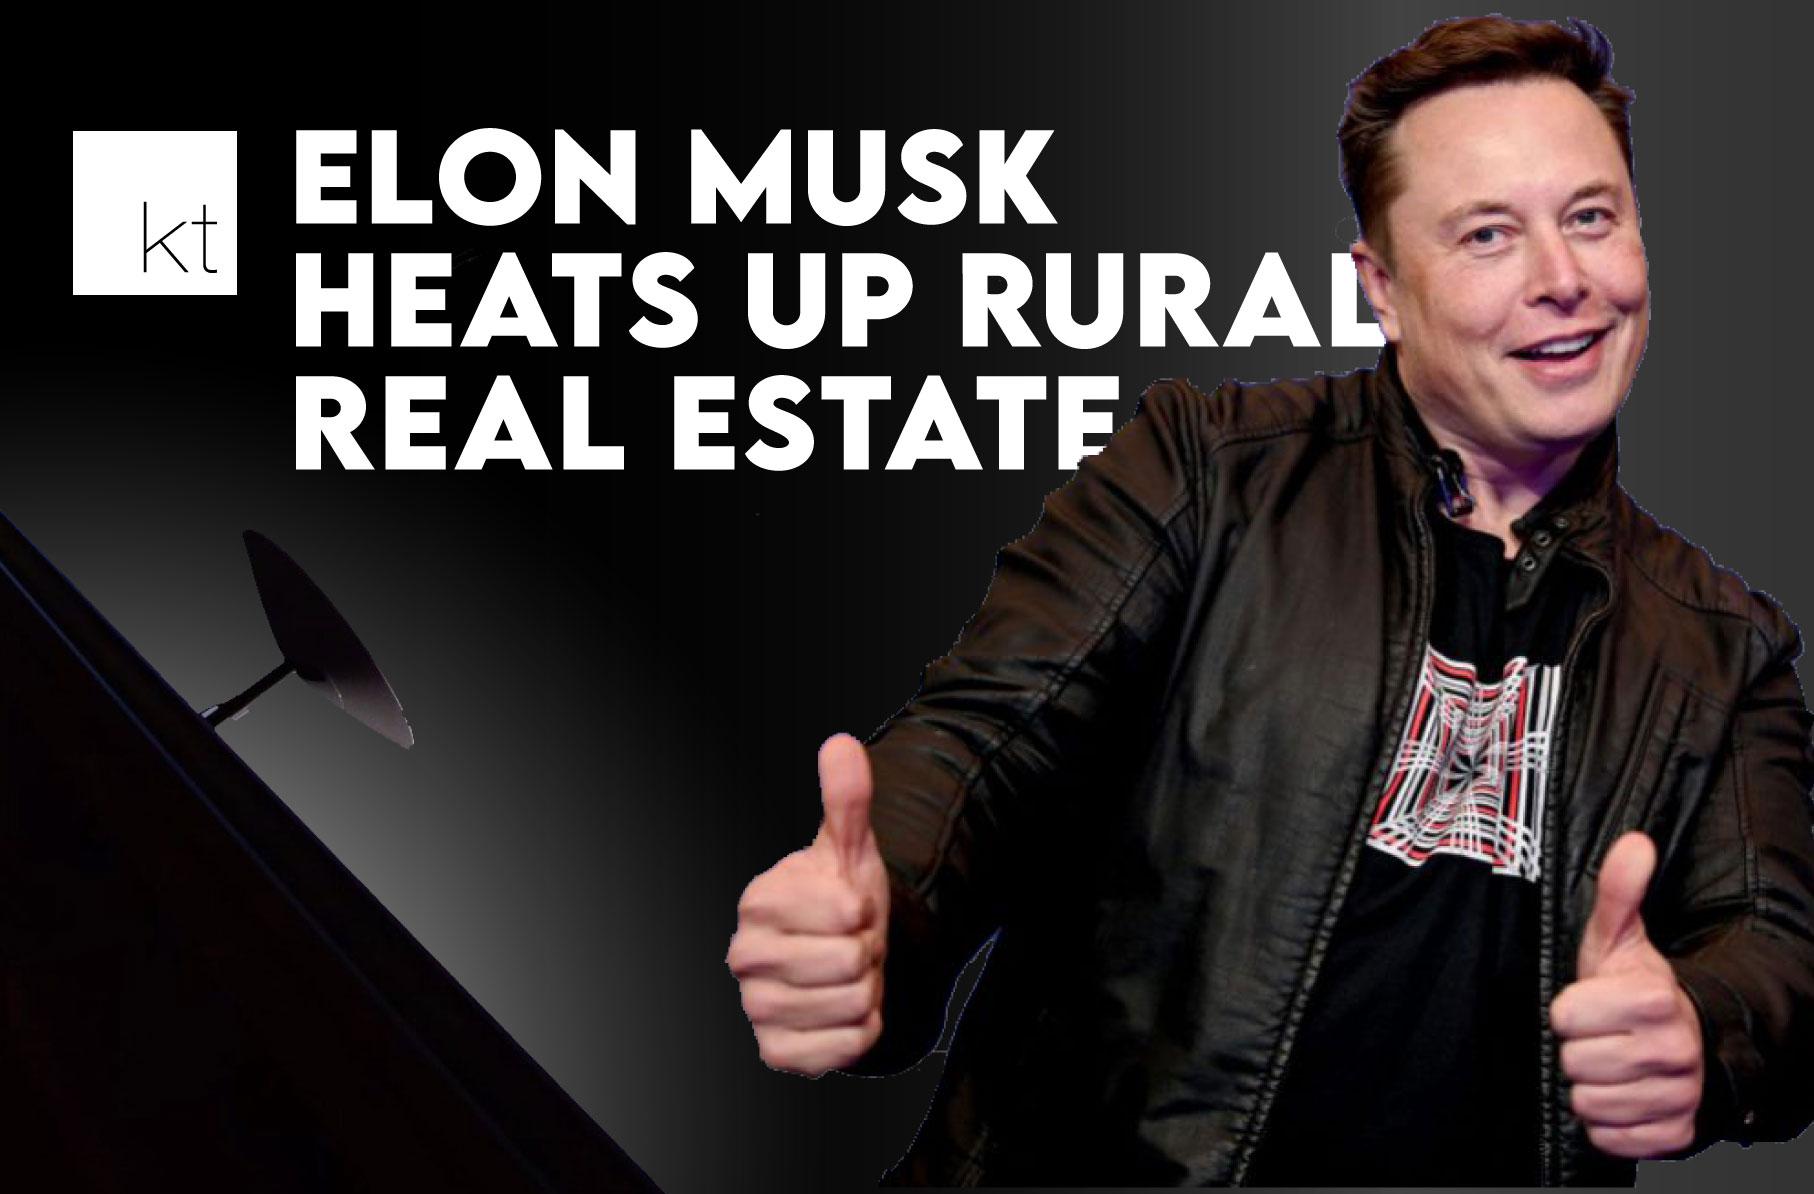 Elon Musk Starlink Rural Real Estate